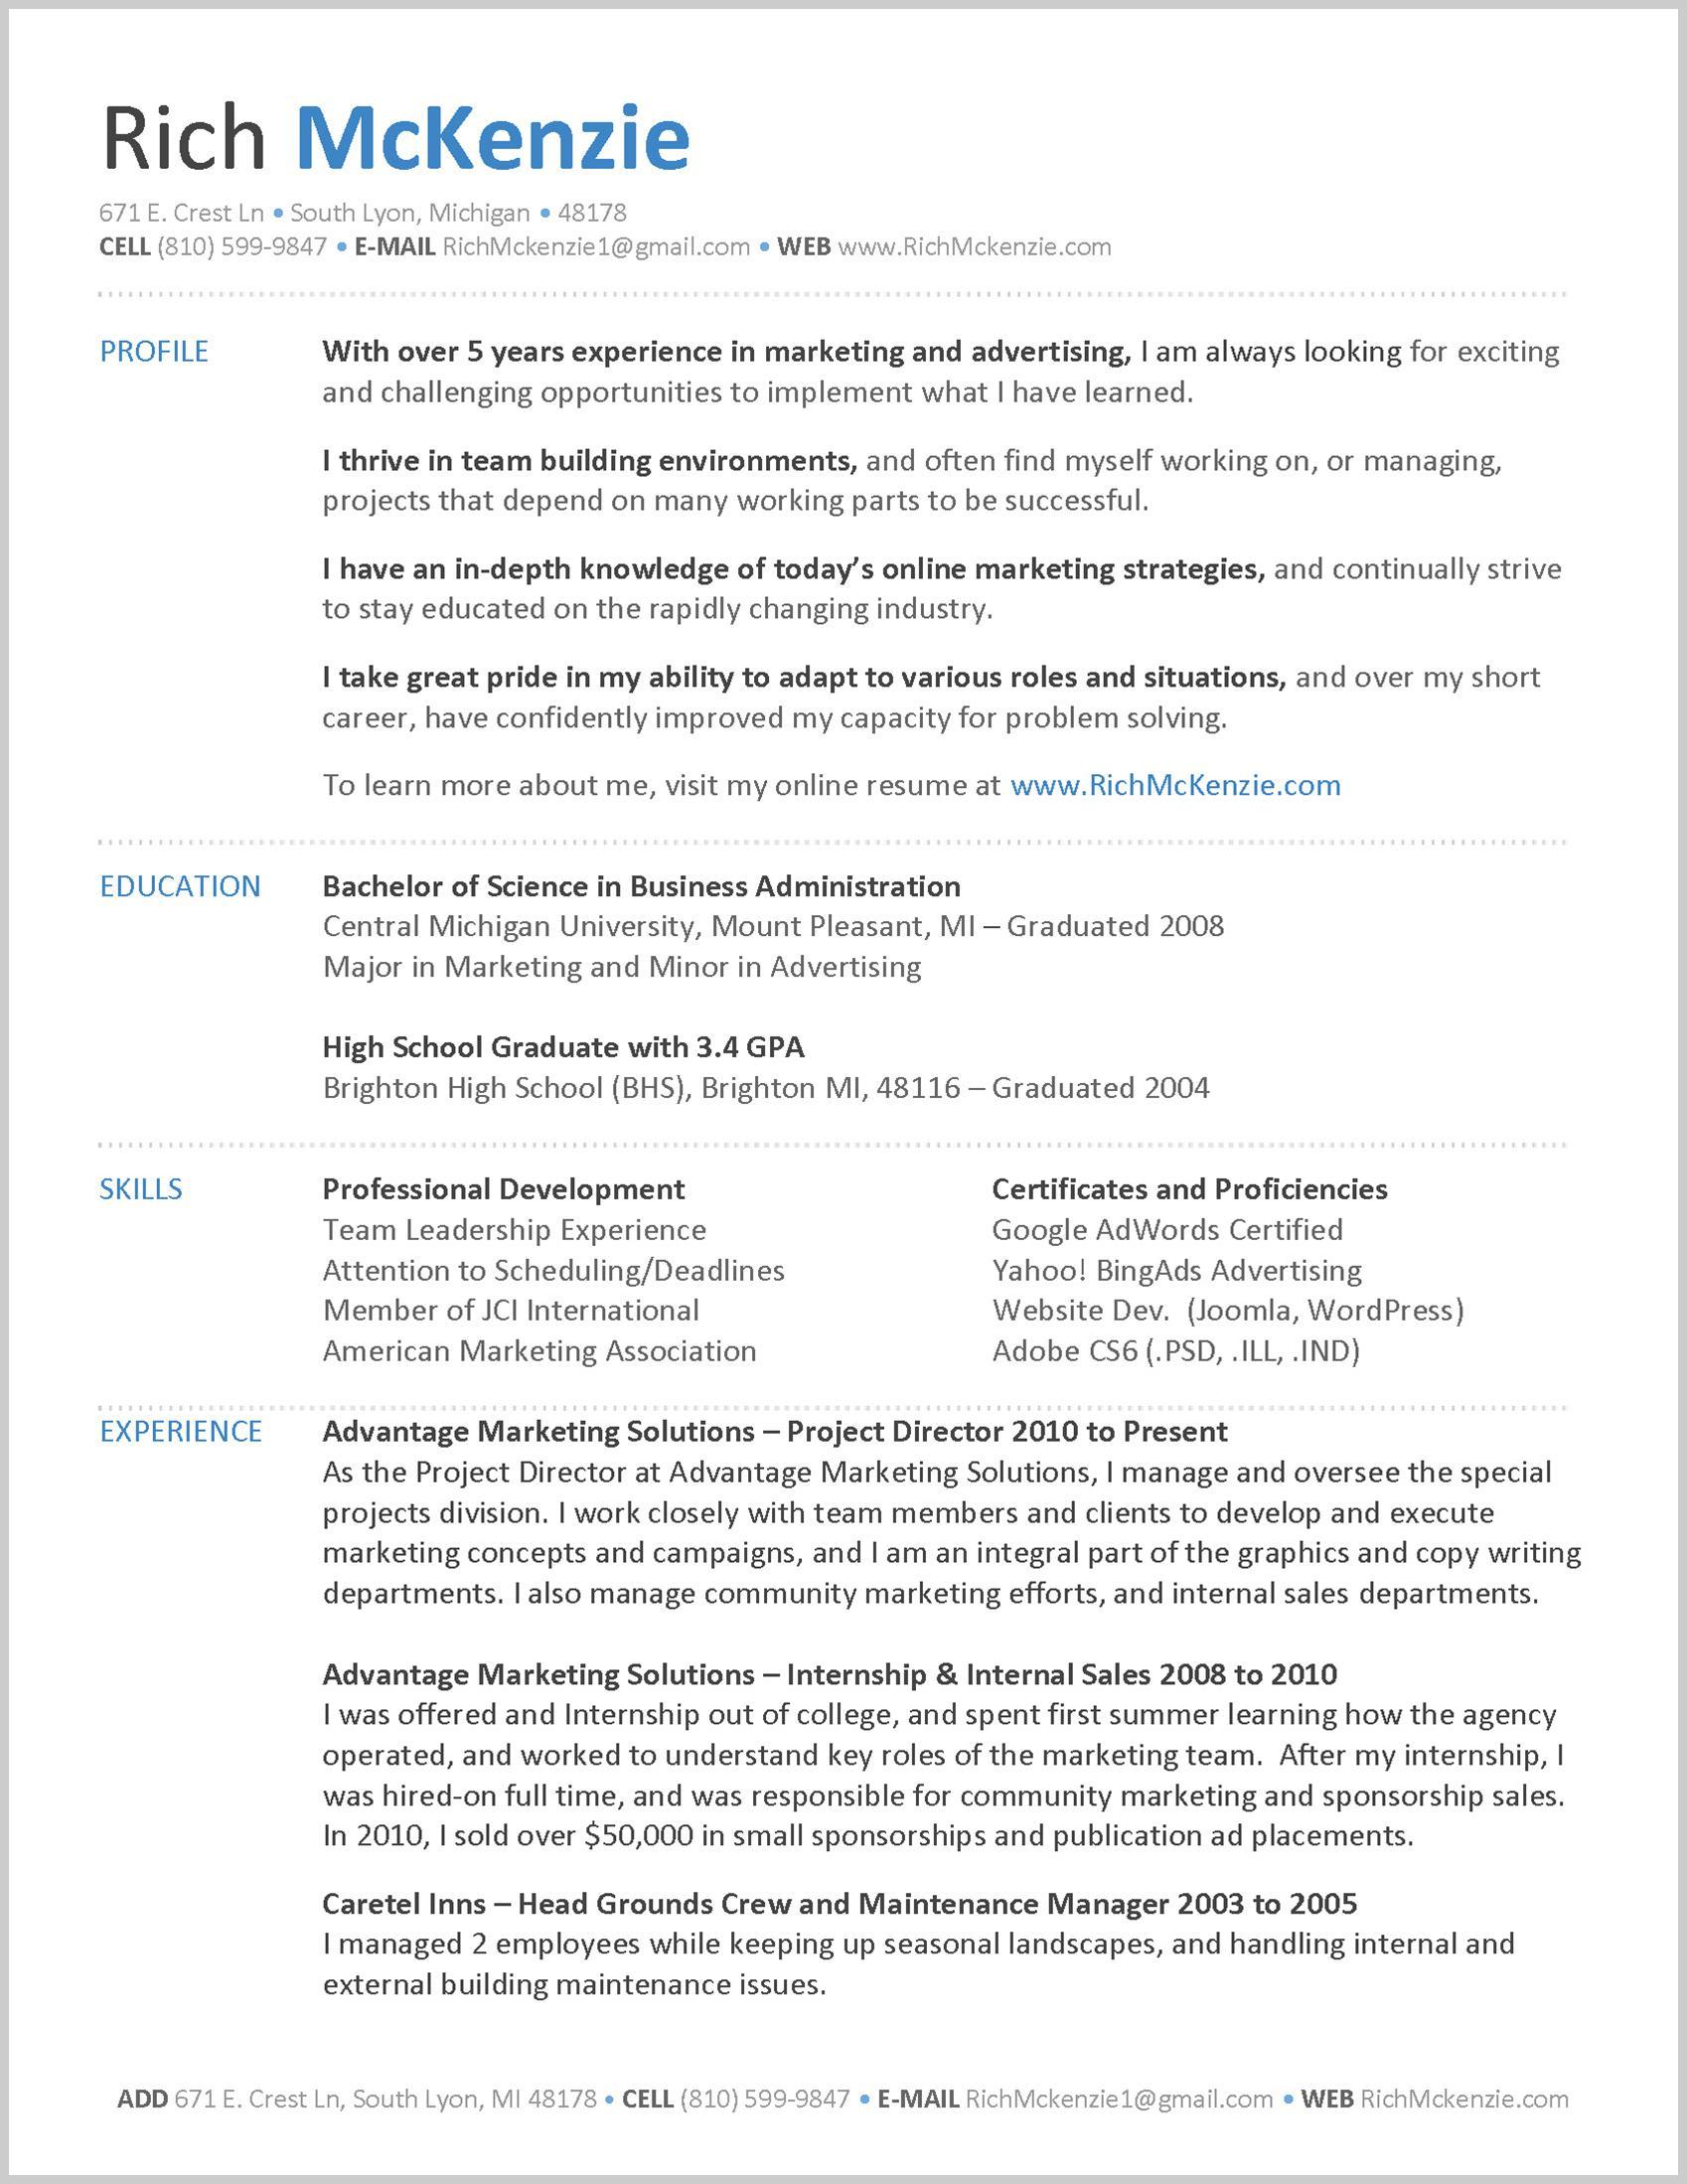 nursing resume creator sample service resume nursing resume creator resume tips for nurses monster my resume resume cv template examples